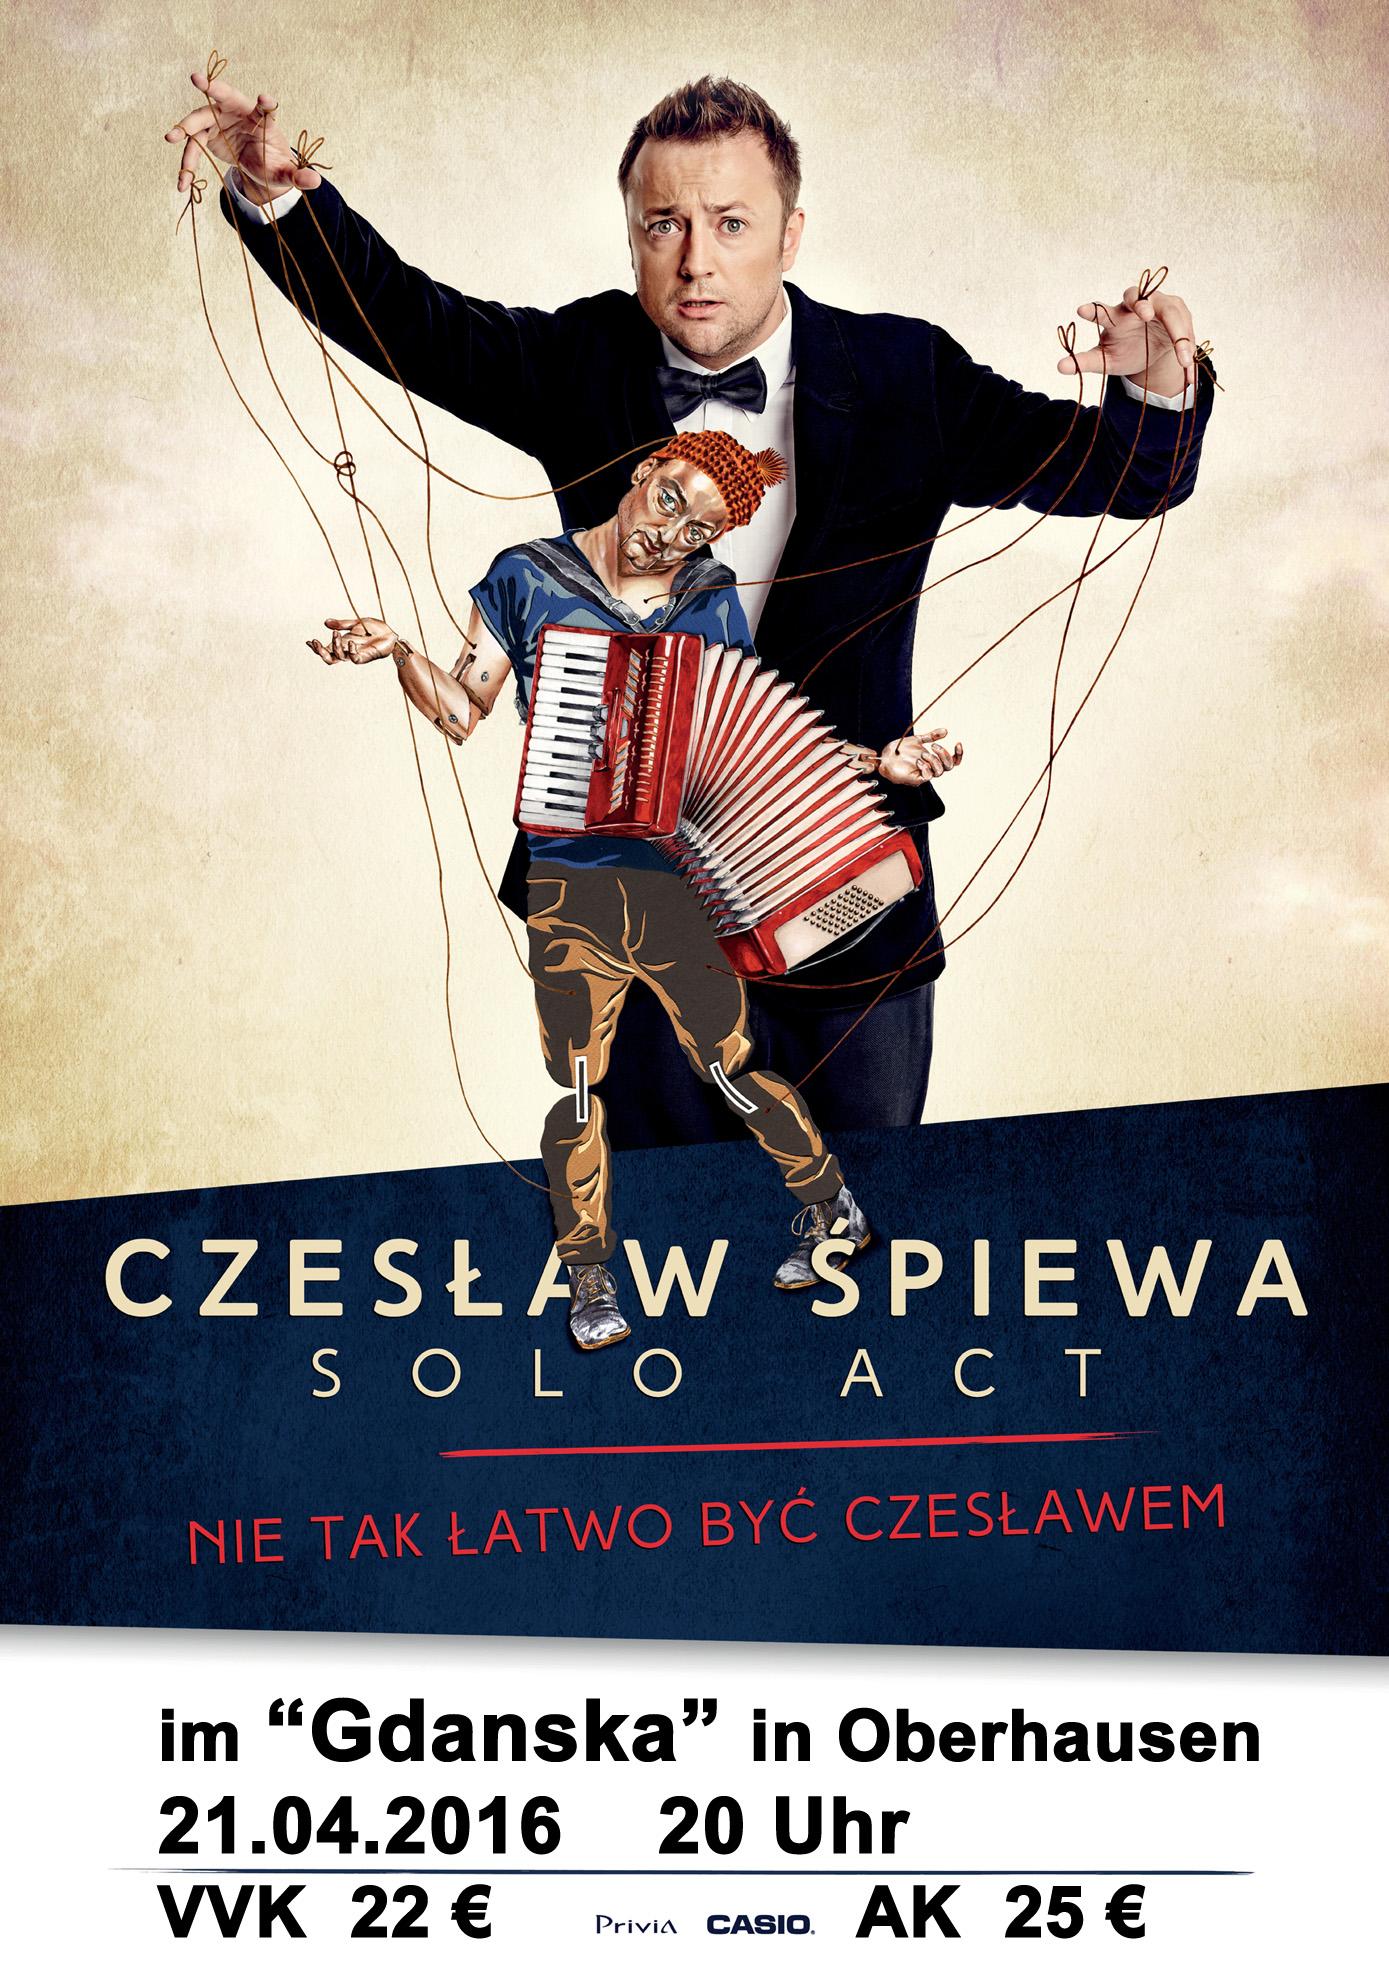 czeslaw spiewa plakat Kopie